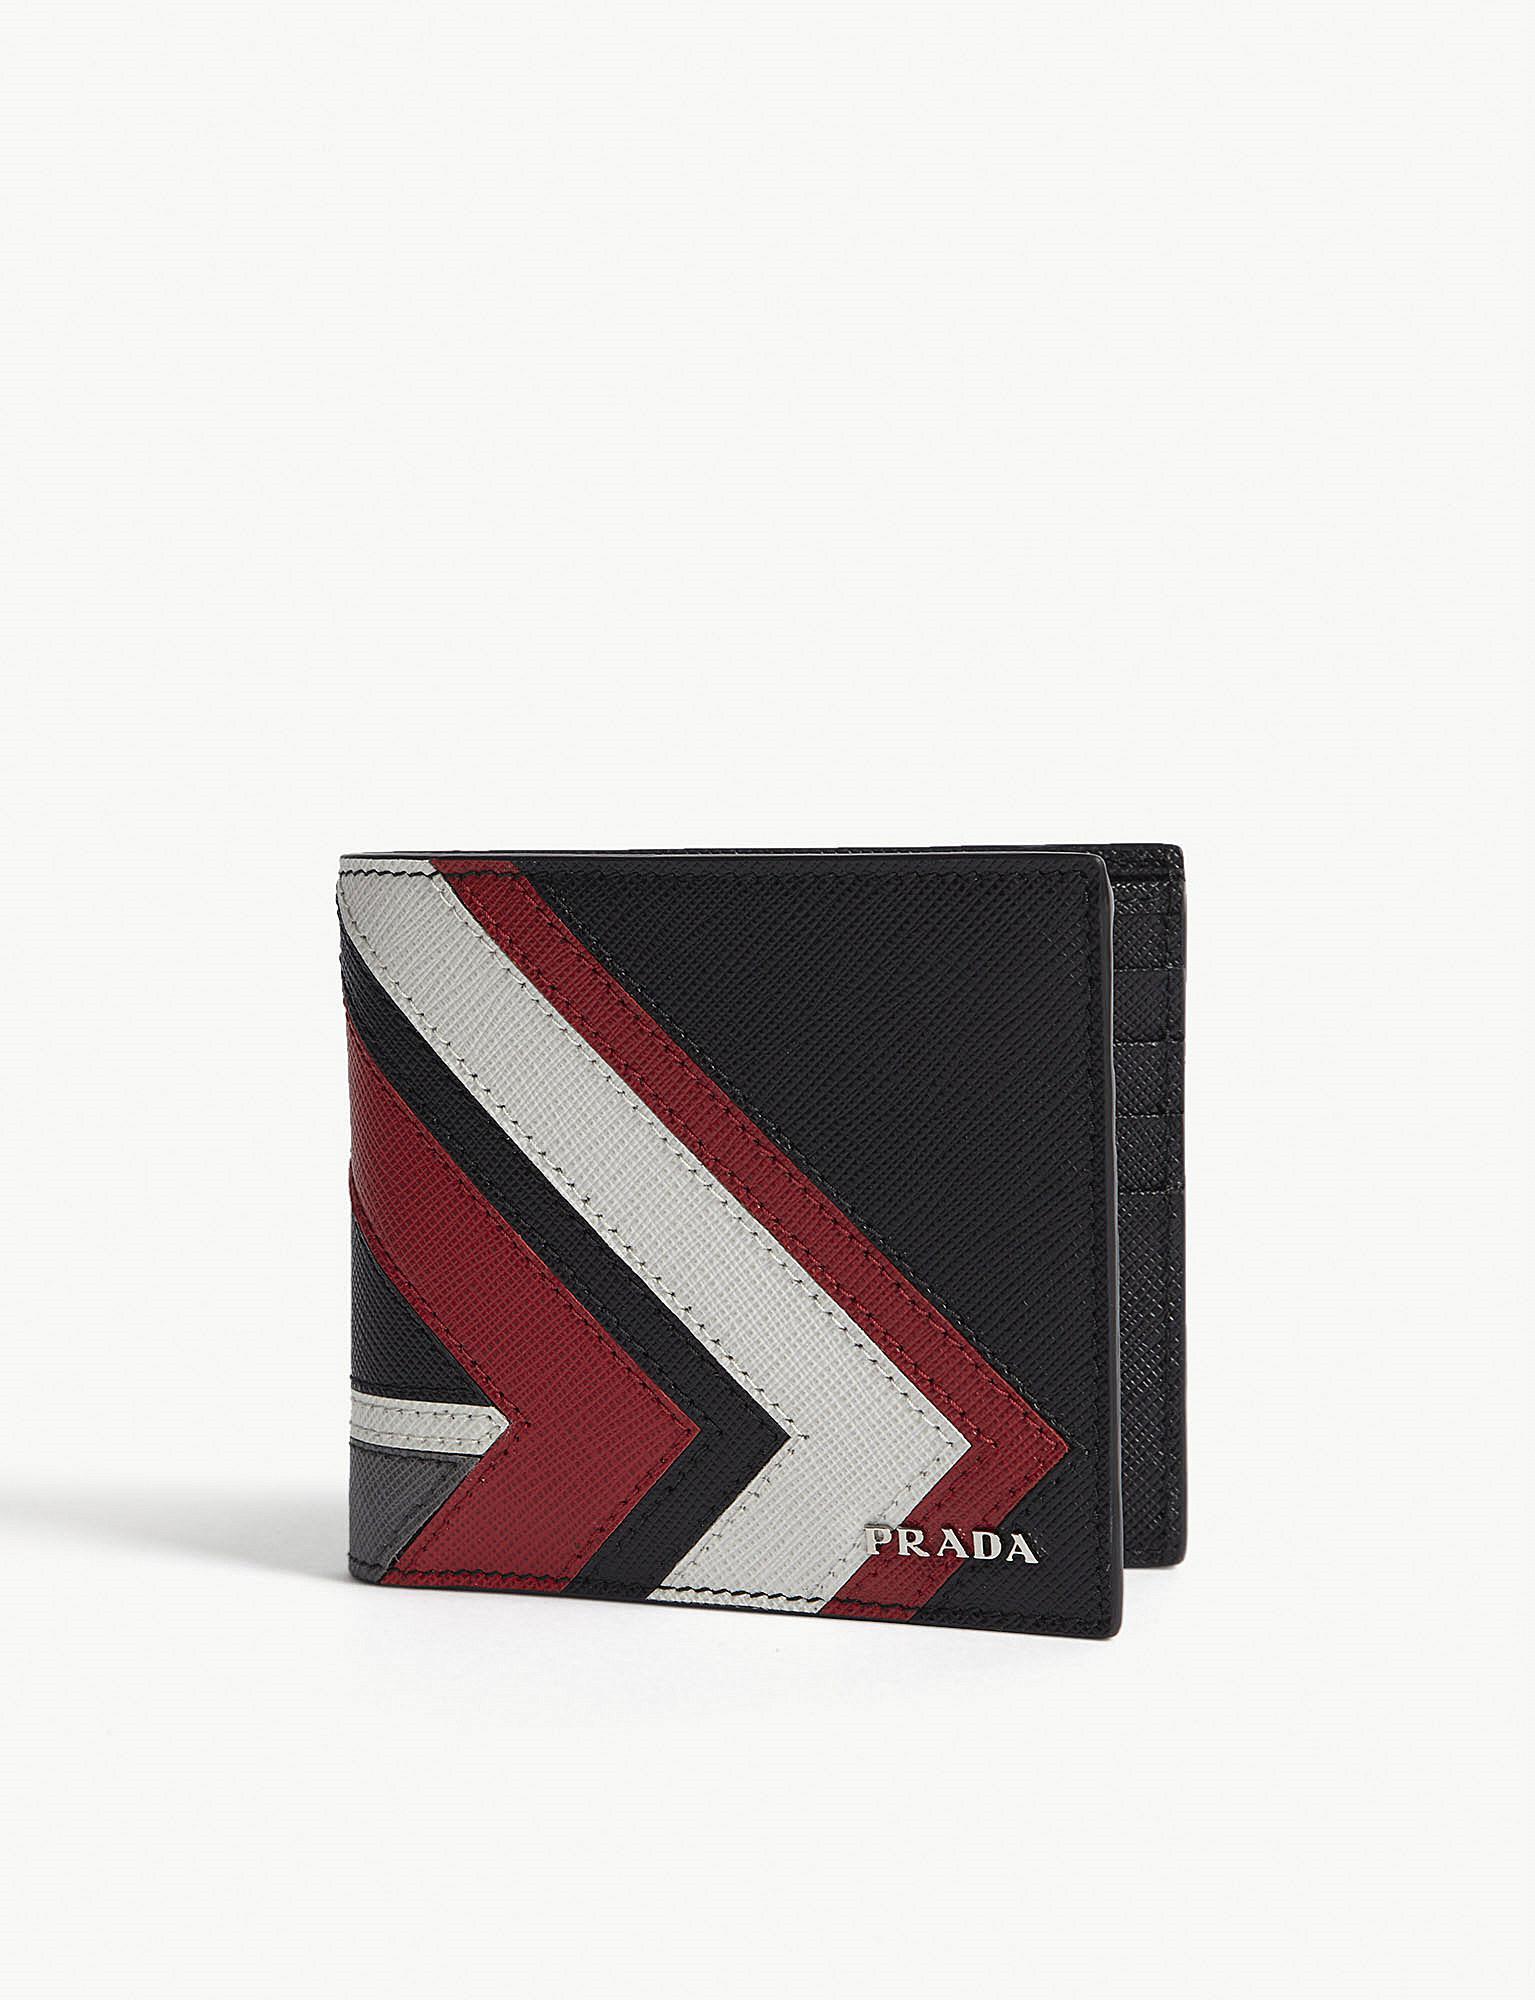 ecd9dbef4199 Prada Chevron Saffiano Leather Billfold Wallet in Red for Men - Lyst